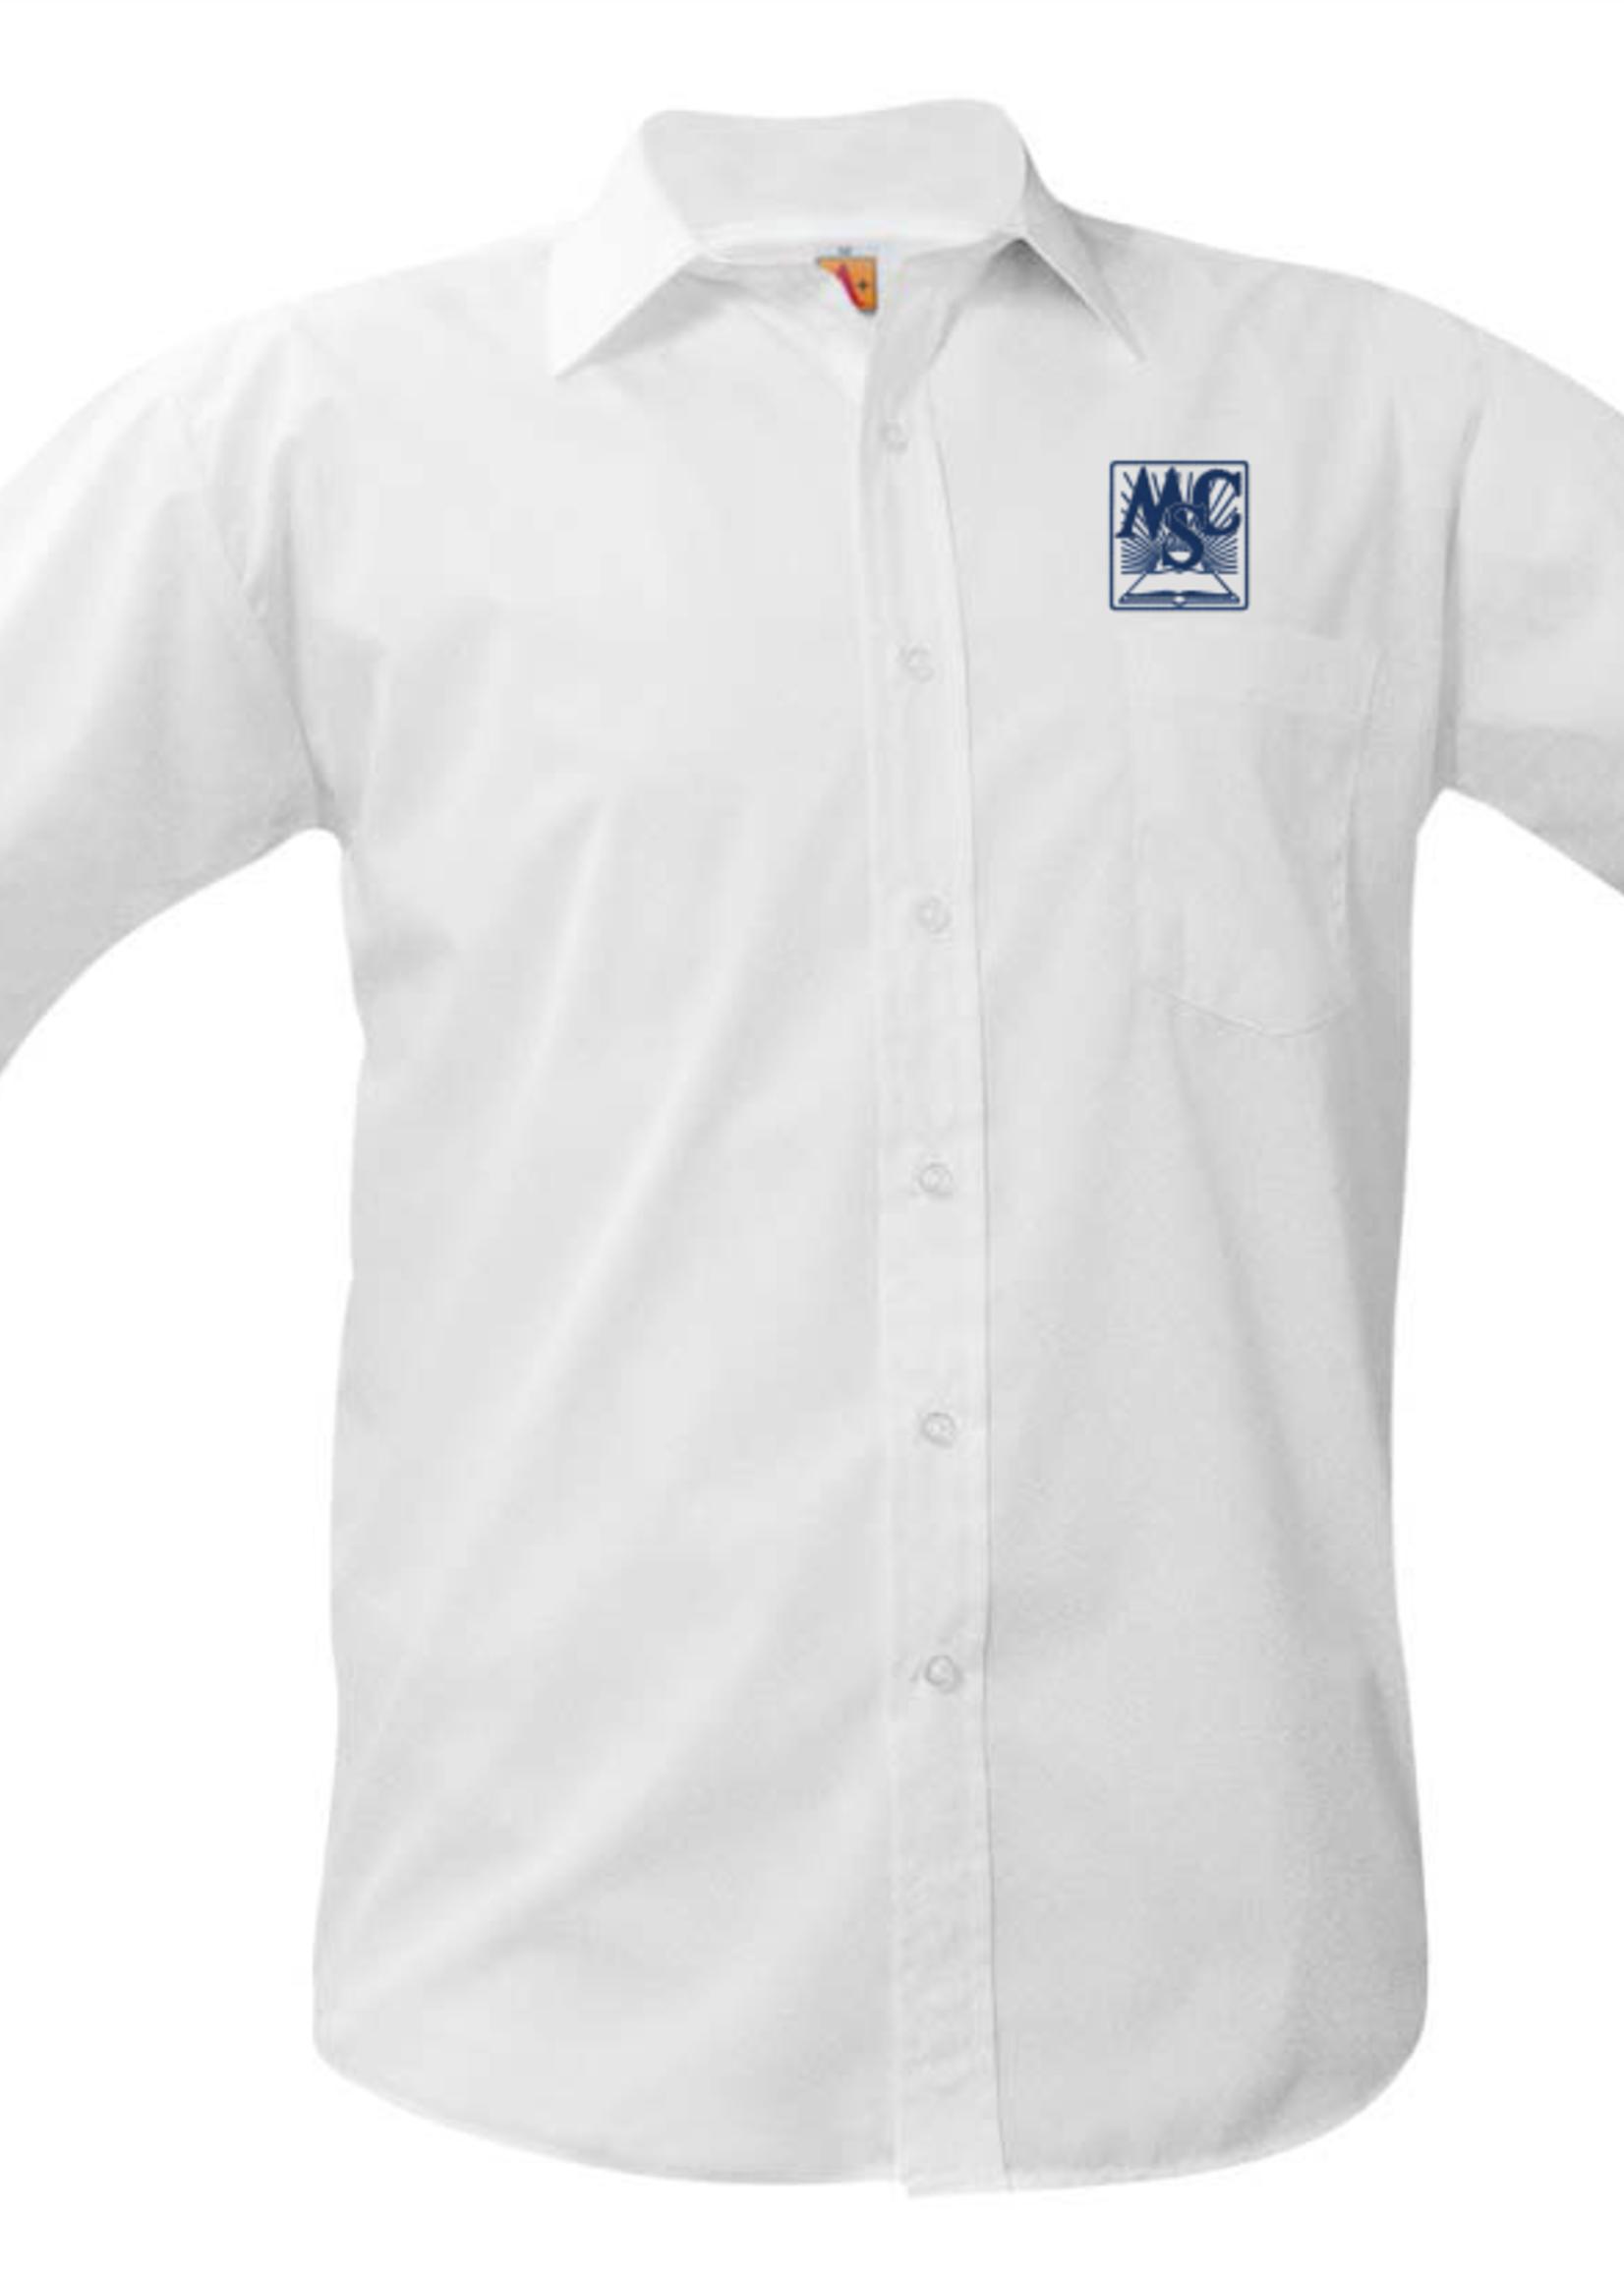 A+ OLMCS White Short Sleeve Broadcloth Shirt